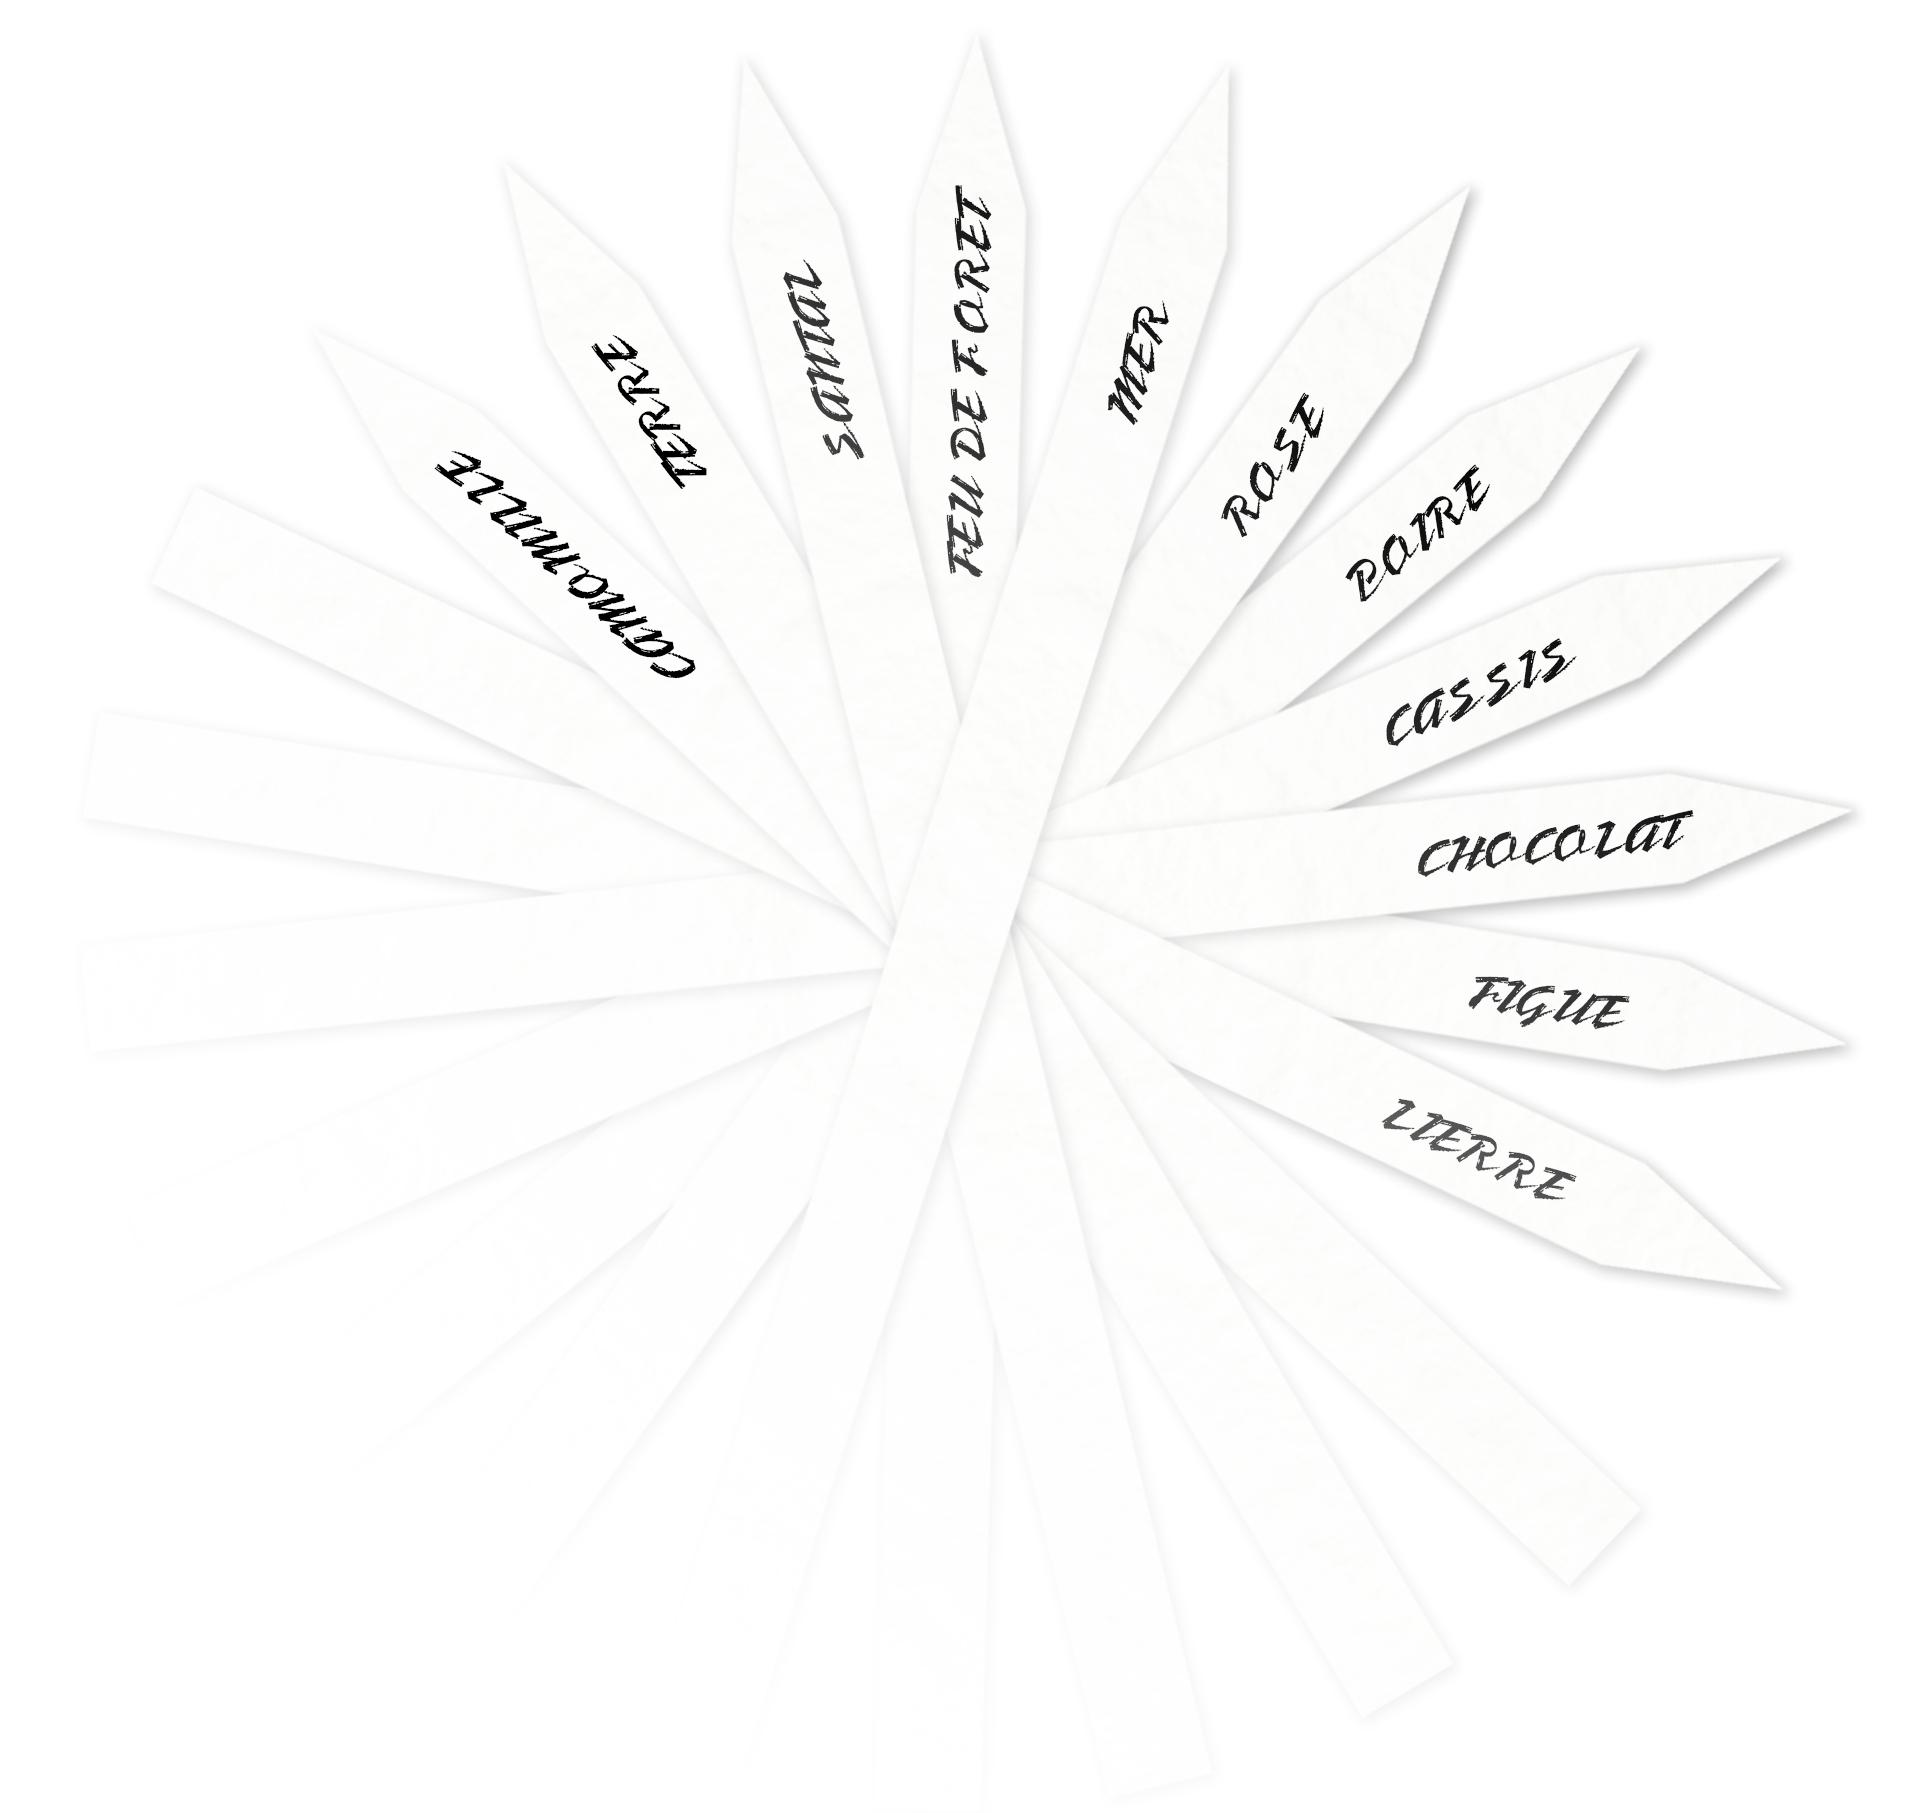 montage_parfum_tests